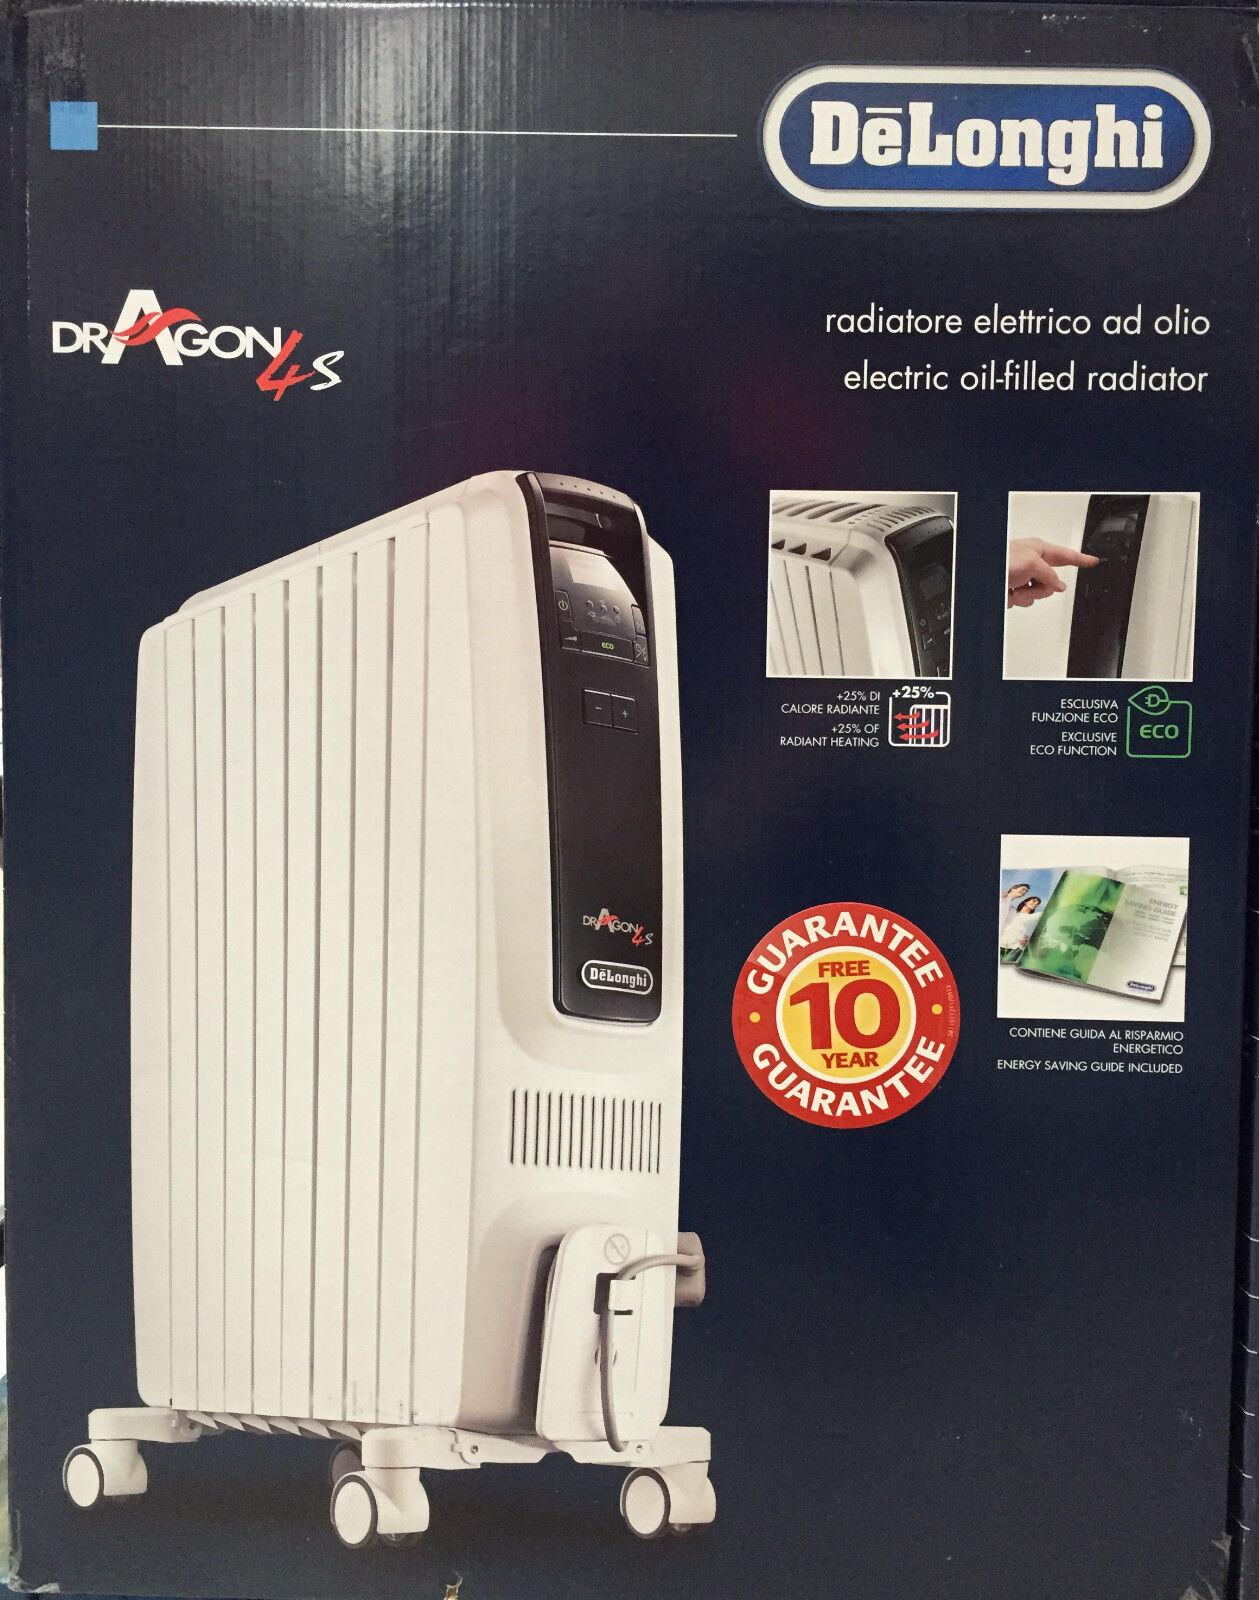 Delonghi safe heat oil filled radiator - Delonghi Dragon 4s 2kw Oil Filled Radiator Trds40820e Portable Heater Brand New